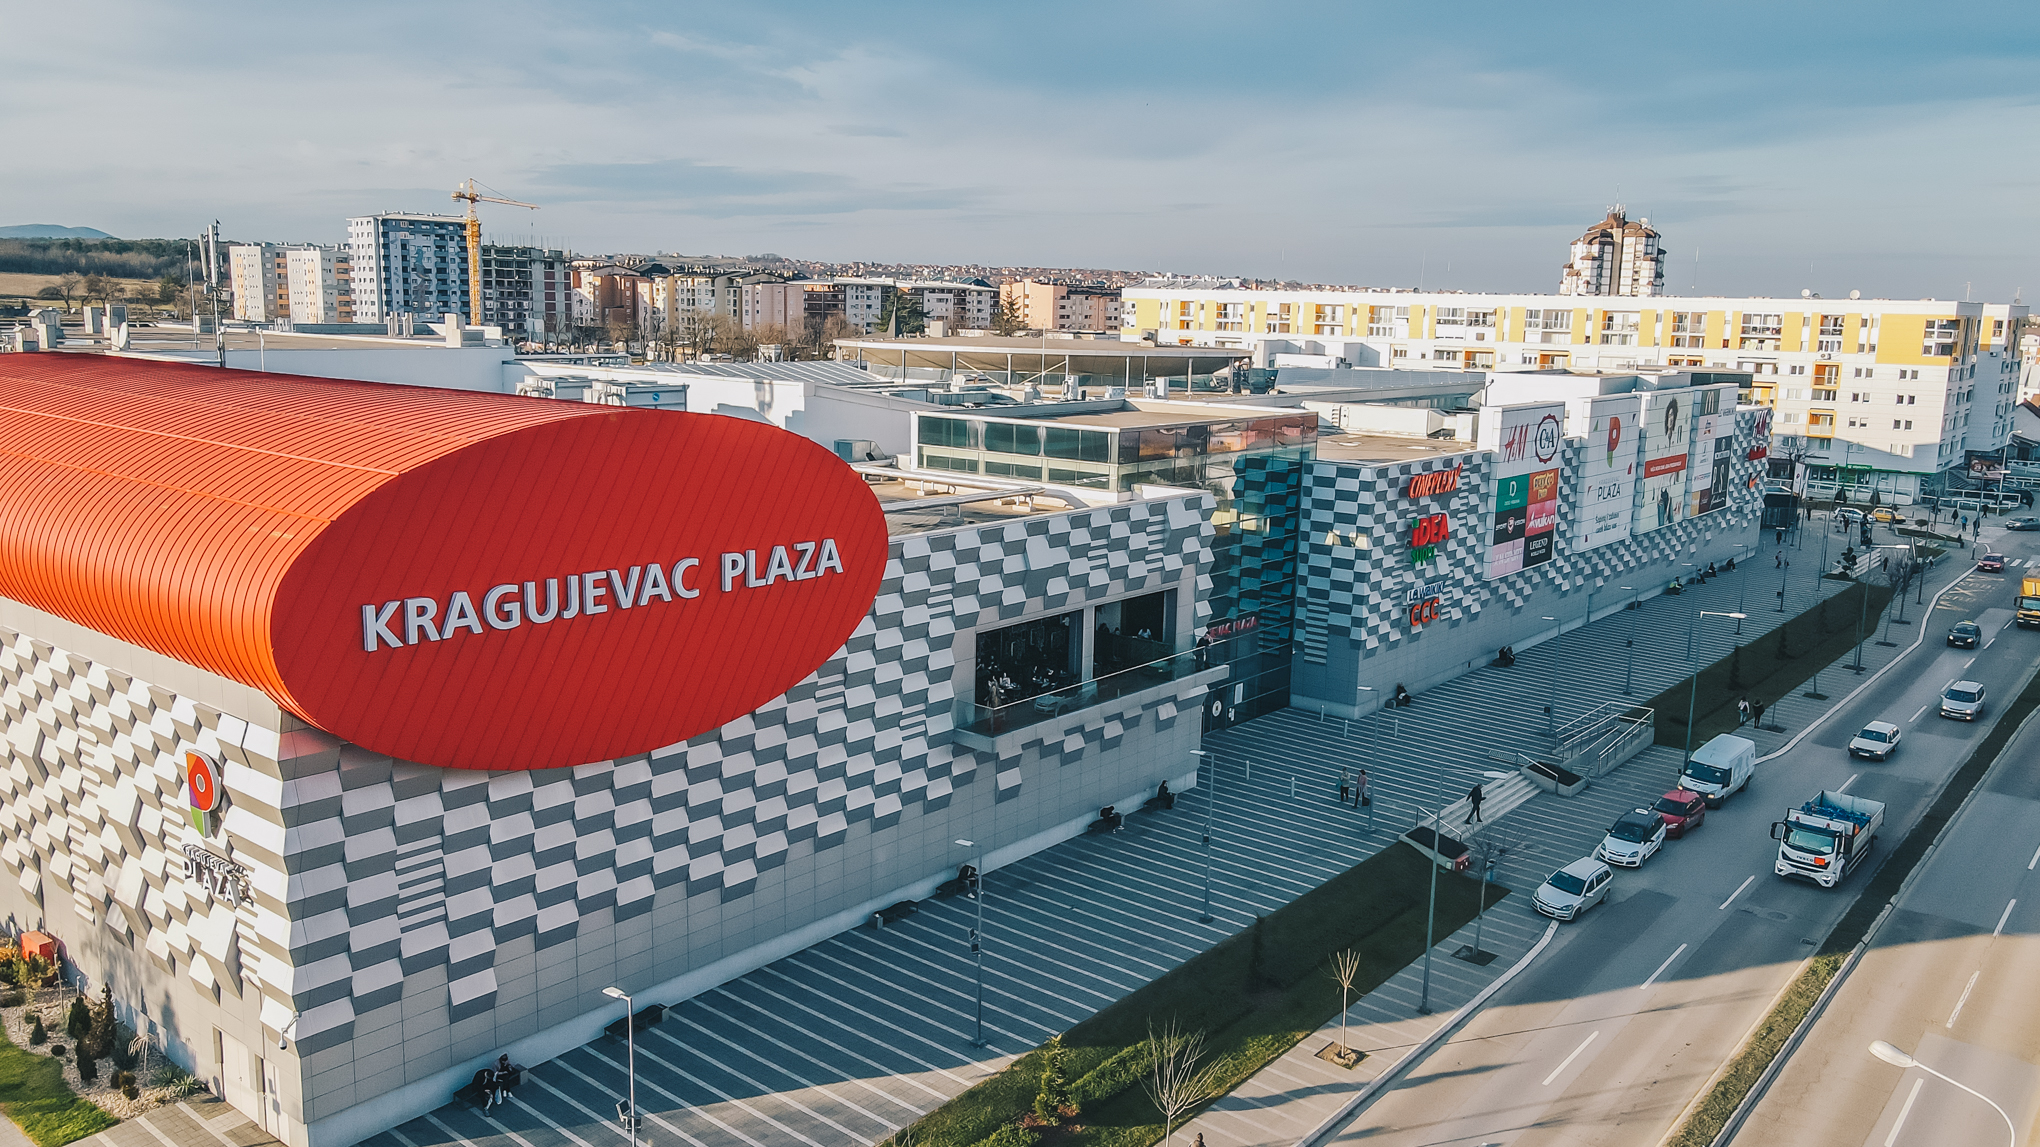 Go to Radost uskršnjih praznika u Kragujevac Plaza centru